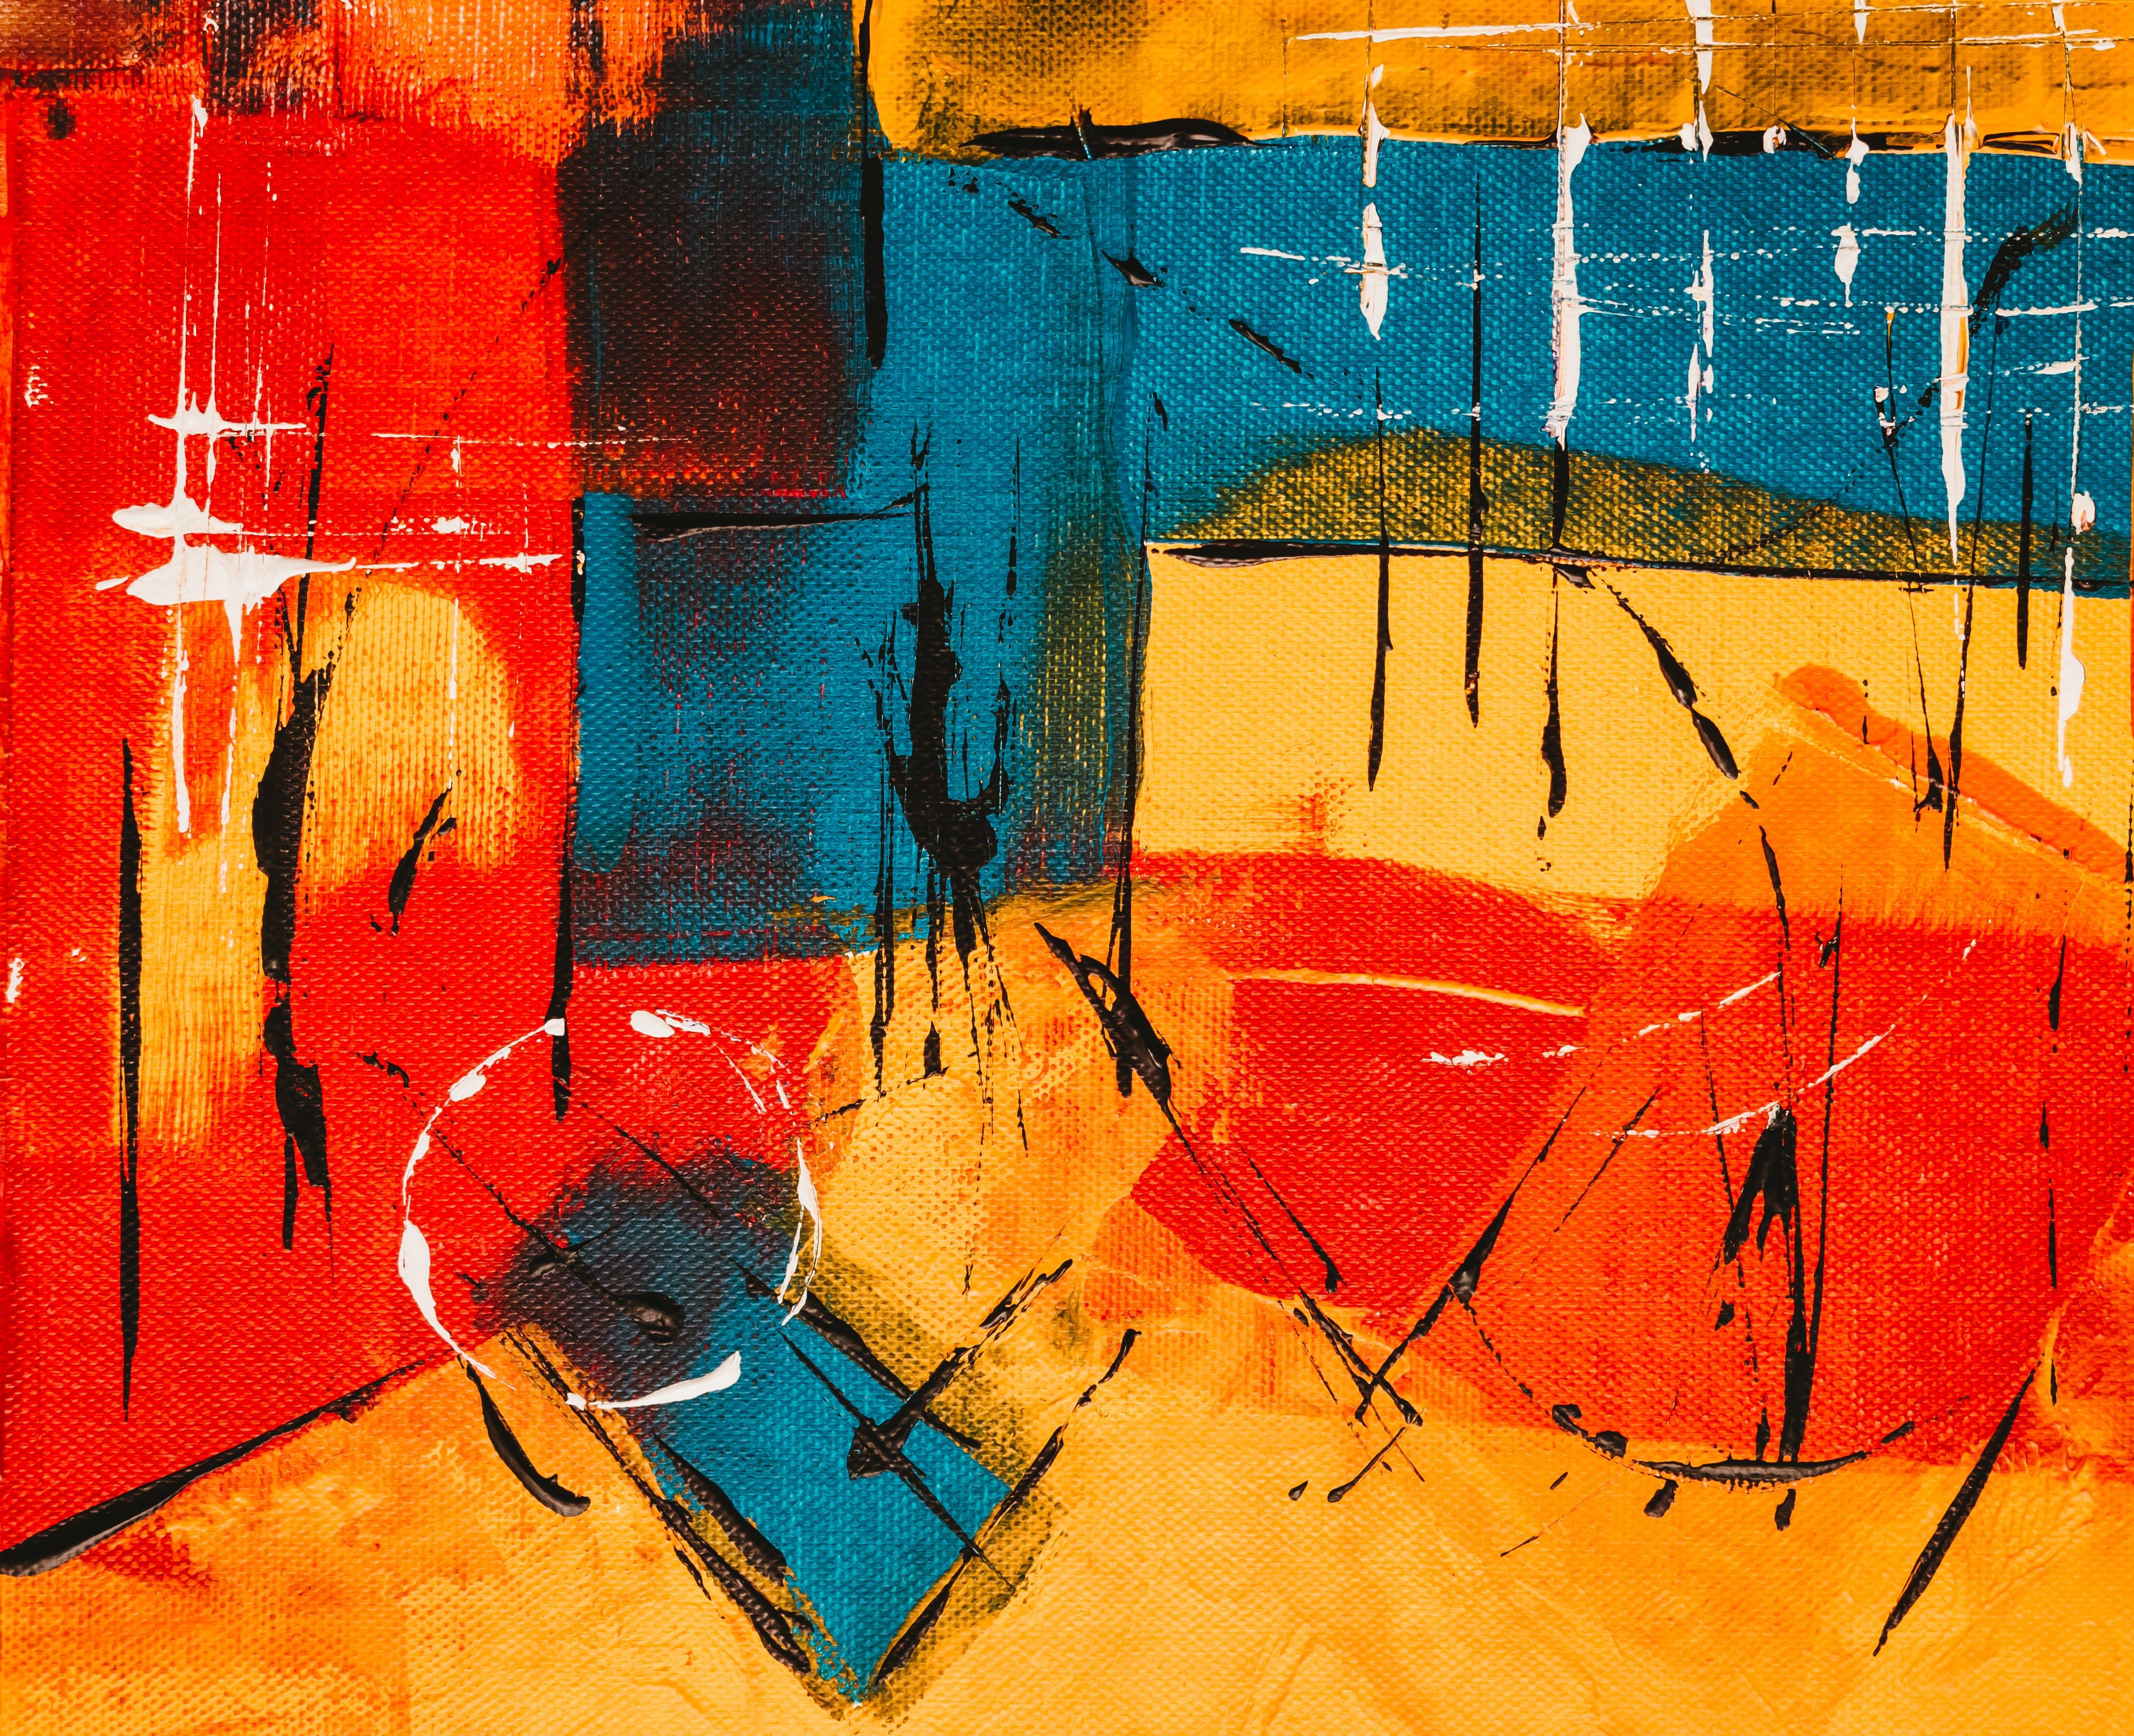 Kostenloses Stock Foto zu abbildung, abstraktes gemälde, acryl, acrylfarbe